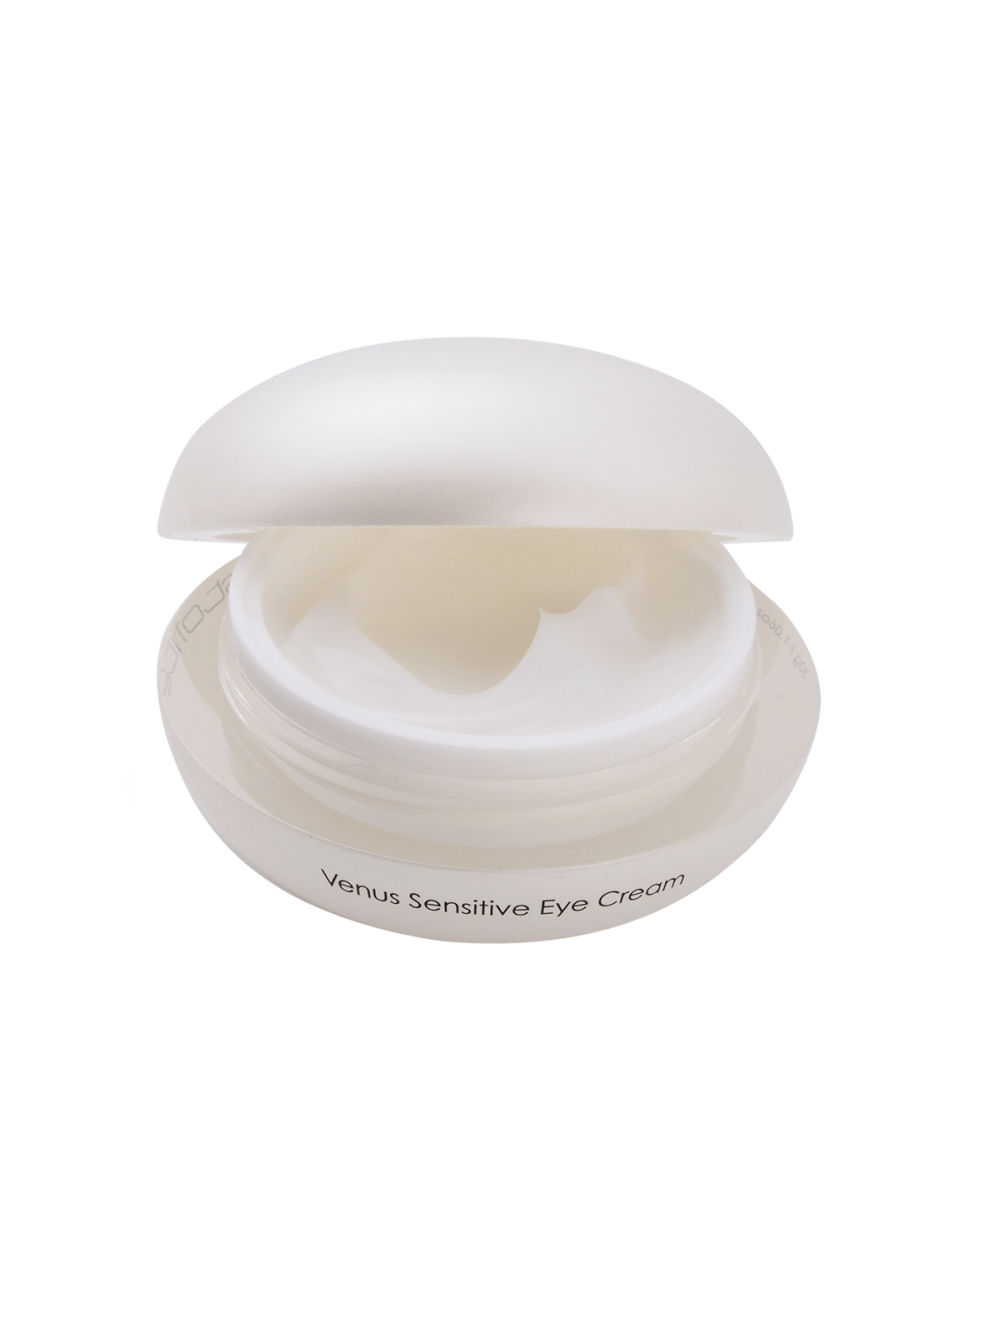 Venus Sensitive Eye Cream top view